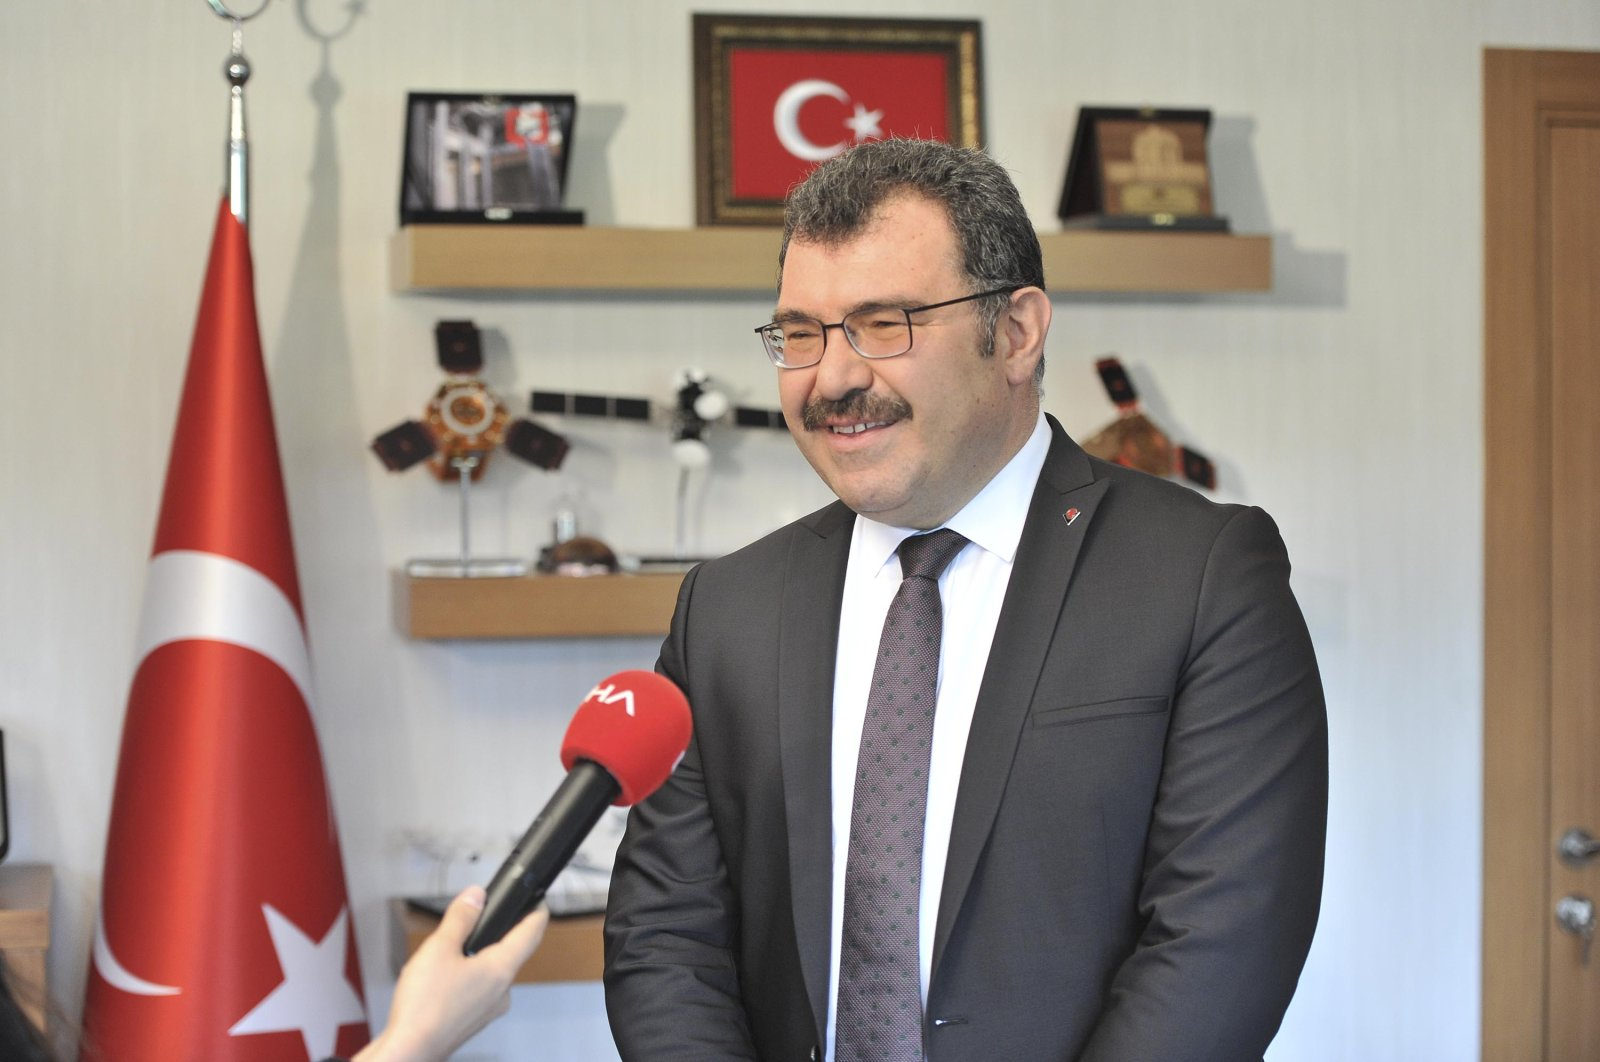 TÜBİTAK President Hasan Mandal. (DHA Photo)